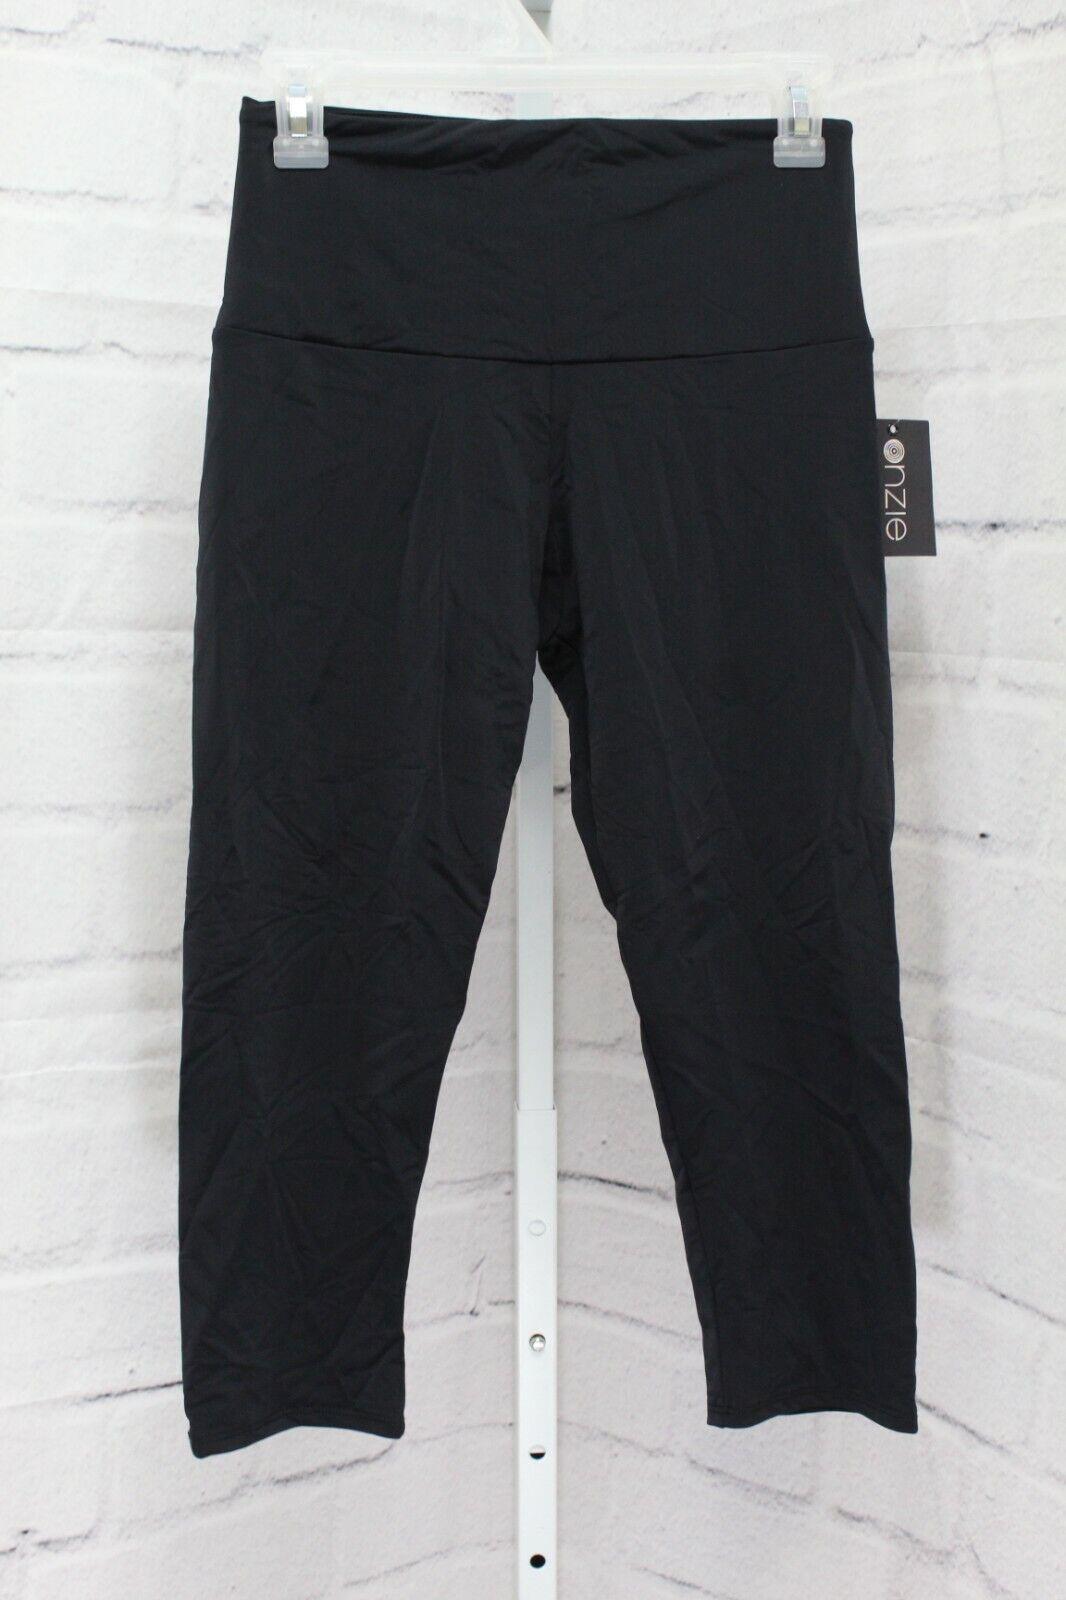 Onzie High Waisted Yoga Capri Pants, Women's Size M/L, Black NEW